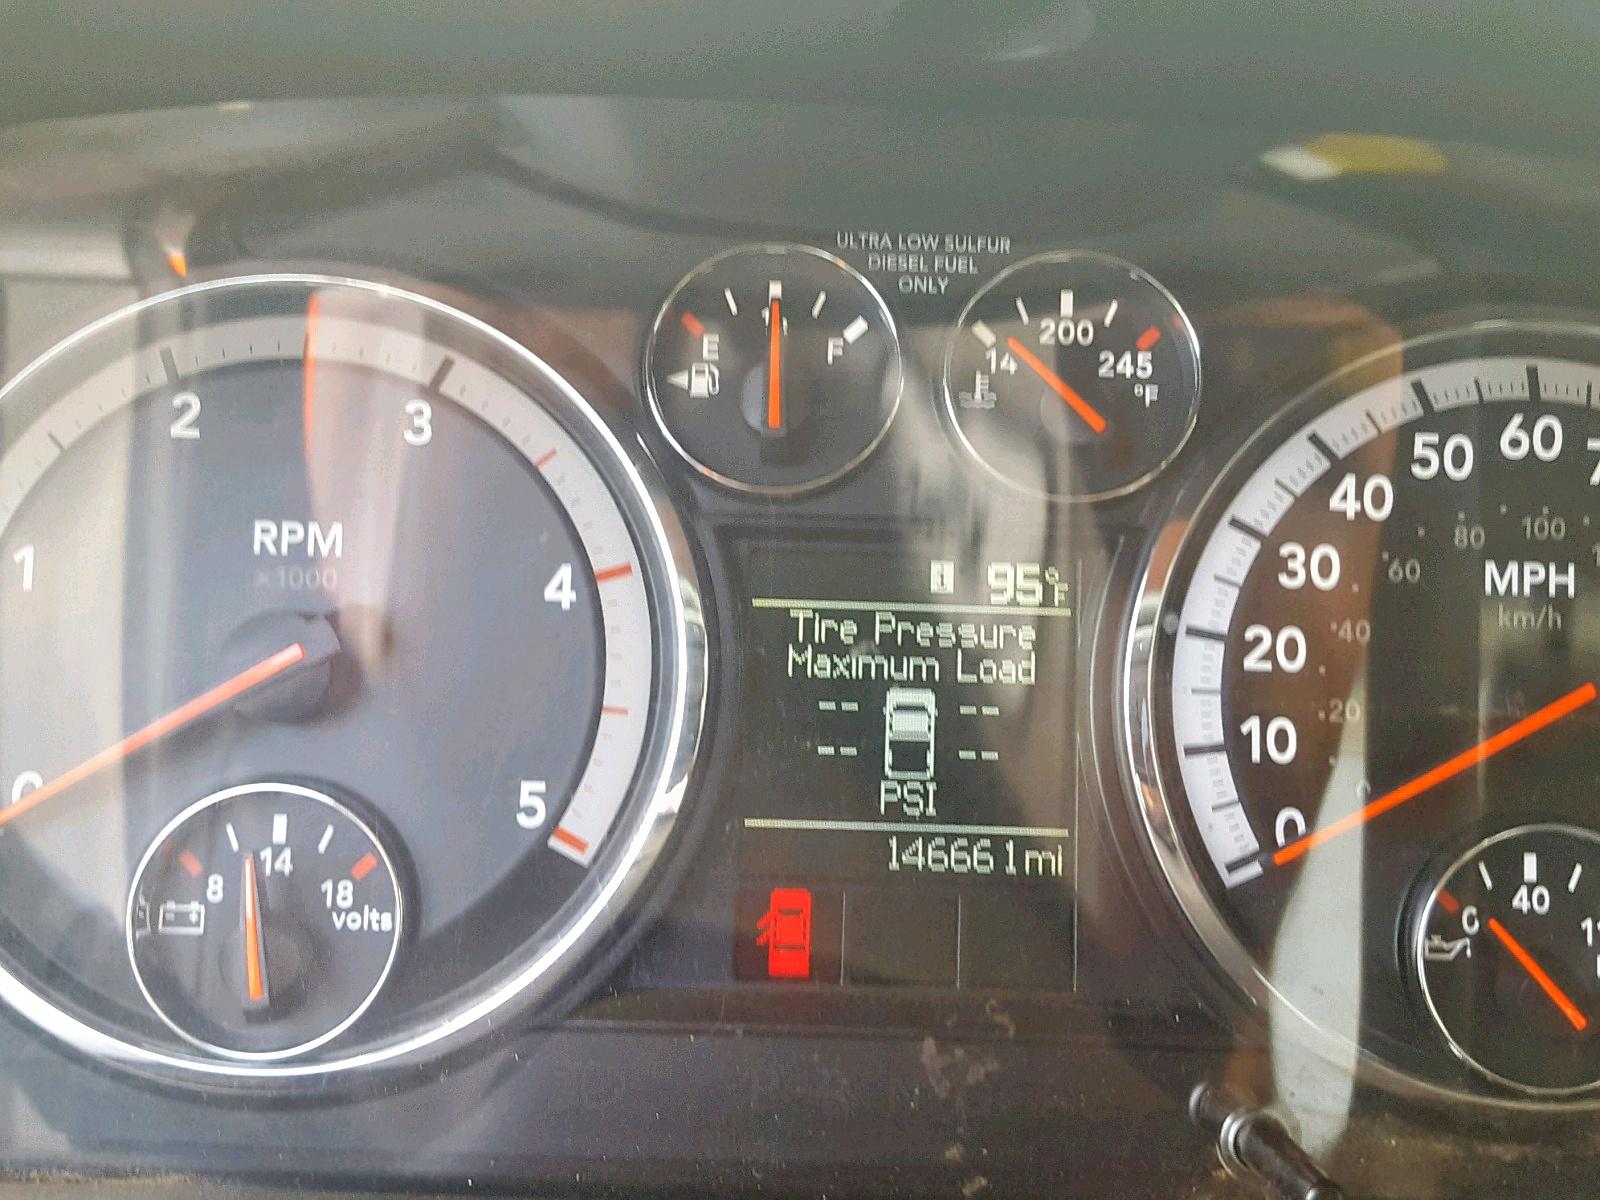 2012 Dodge Ram 2500 S 6 7L 6 in FL - Miami Central